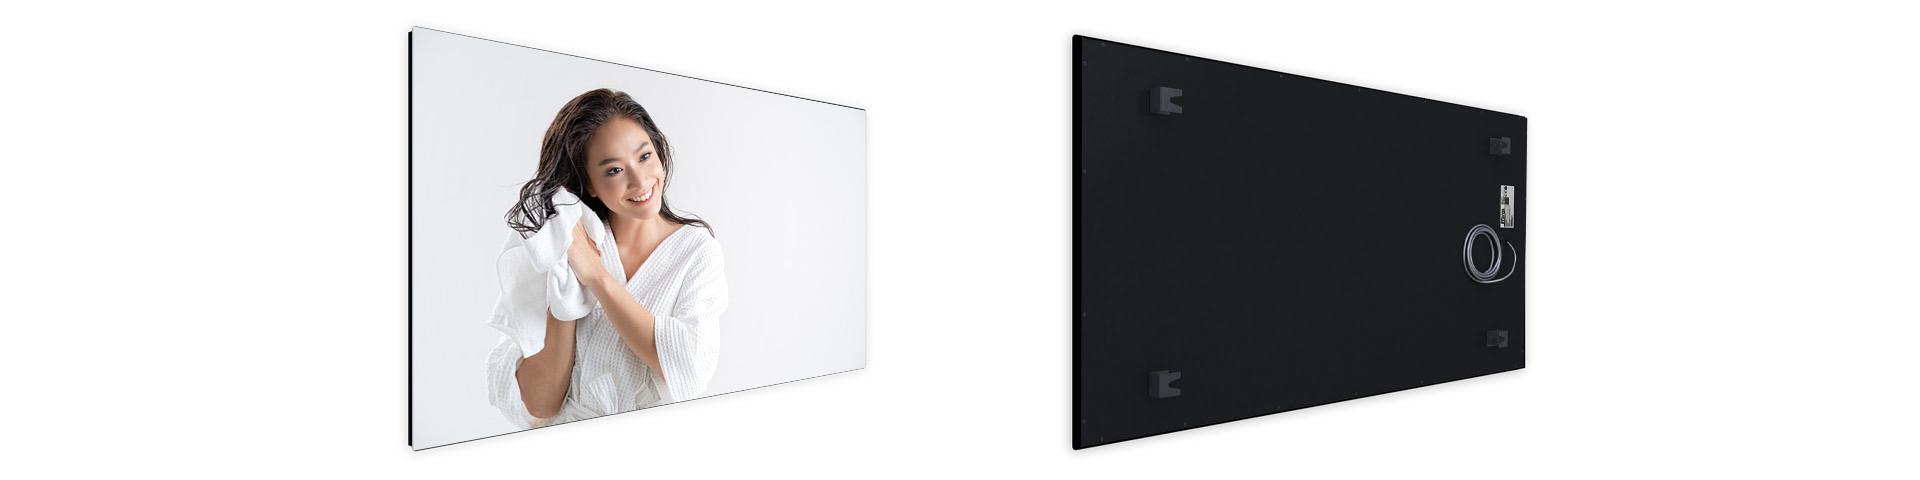 ecaros-mirror-slide-001